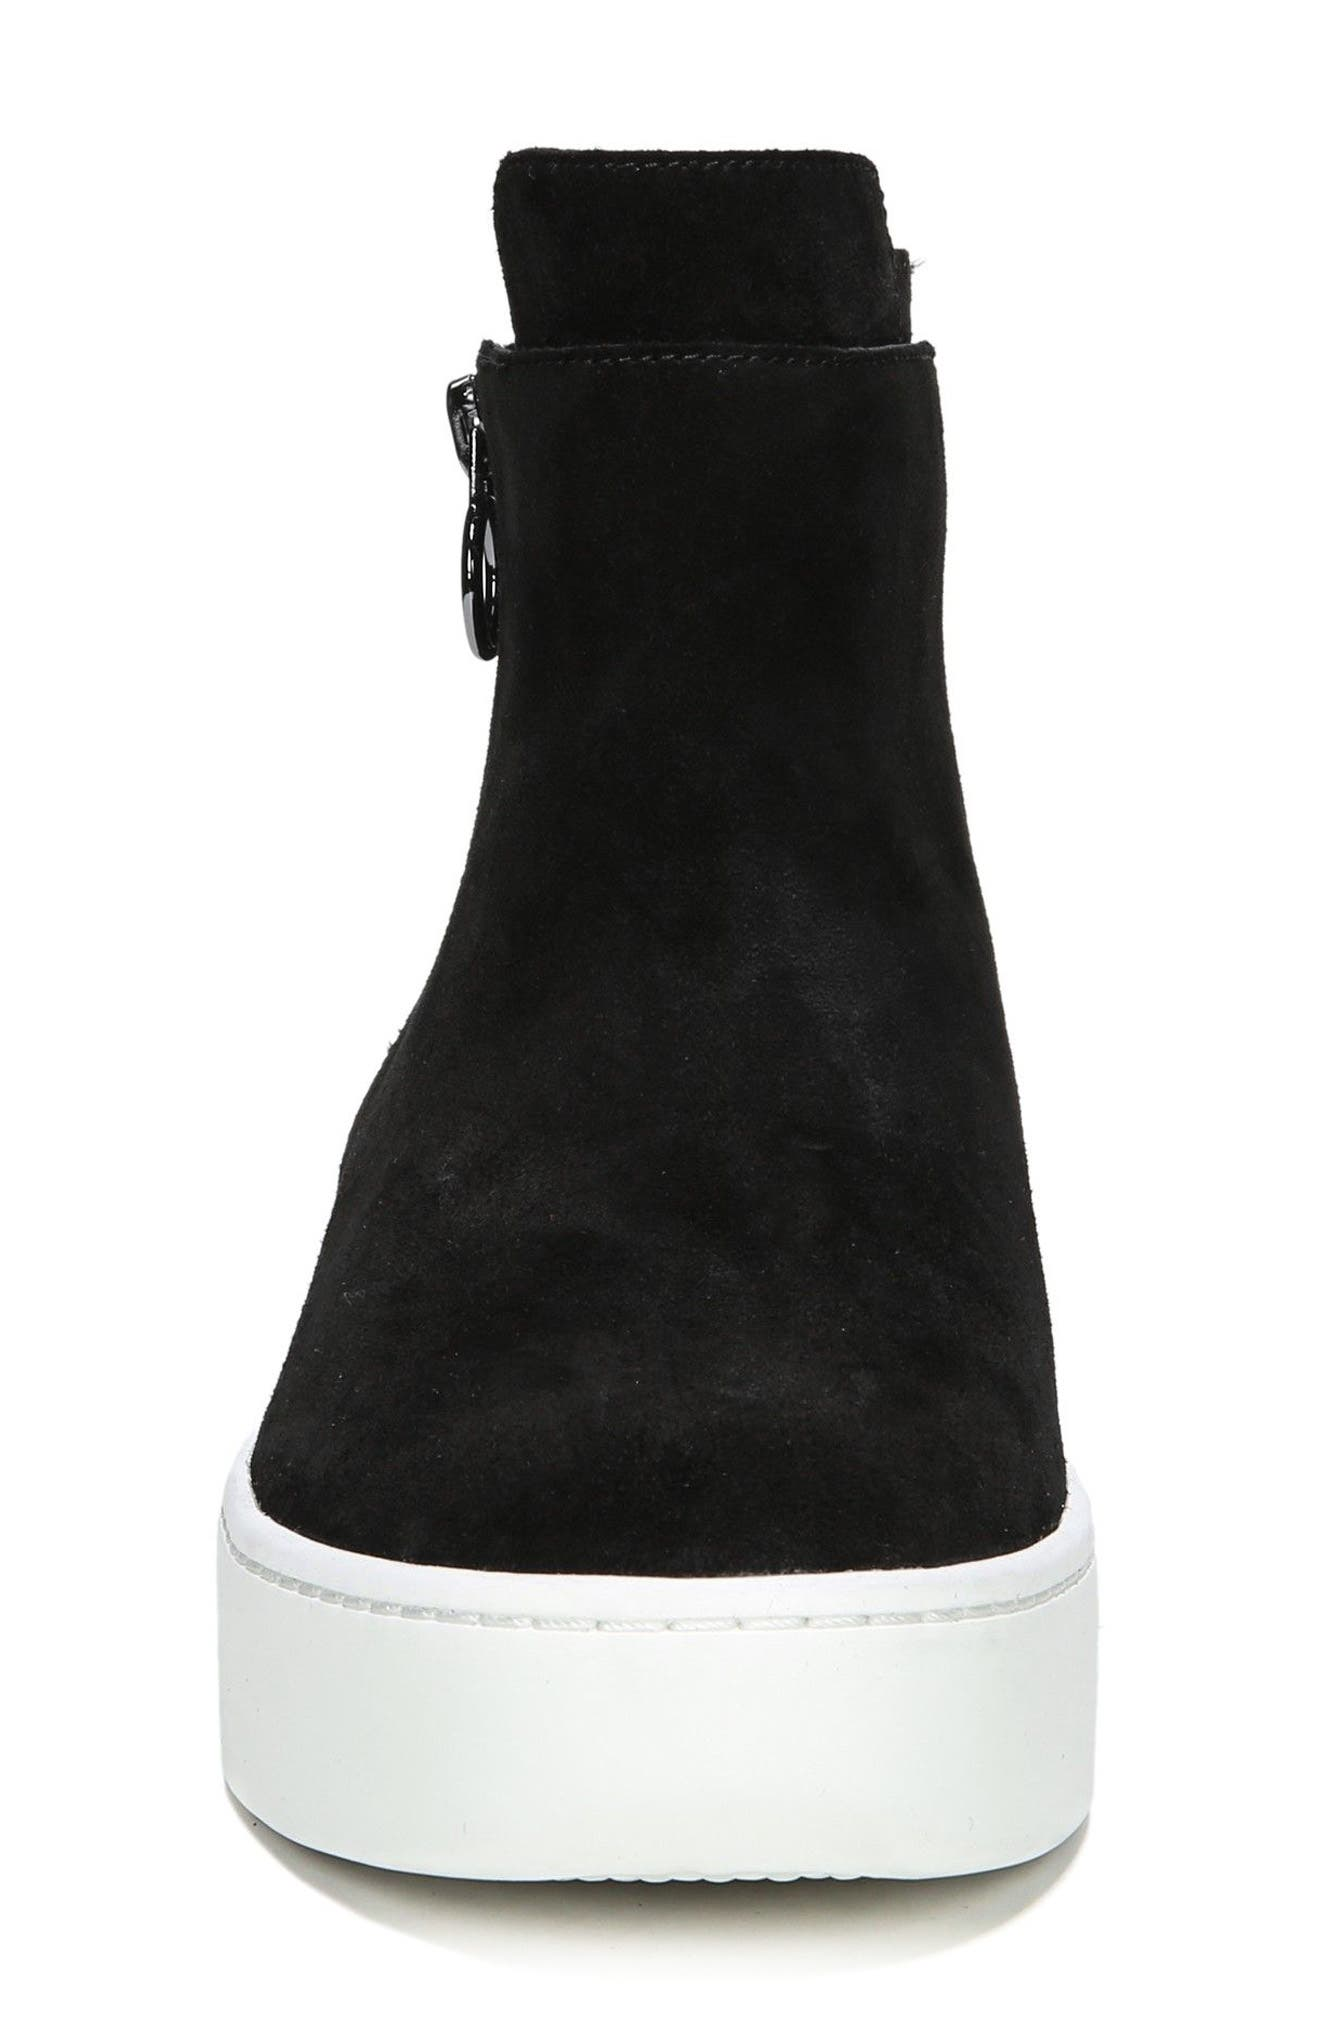 Easton High Top Sneaker,                             Alternate thumbnail 10, color,